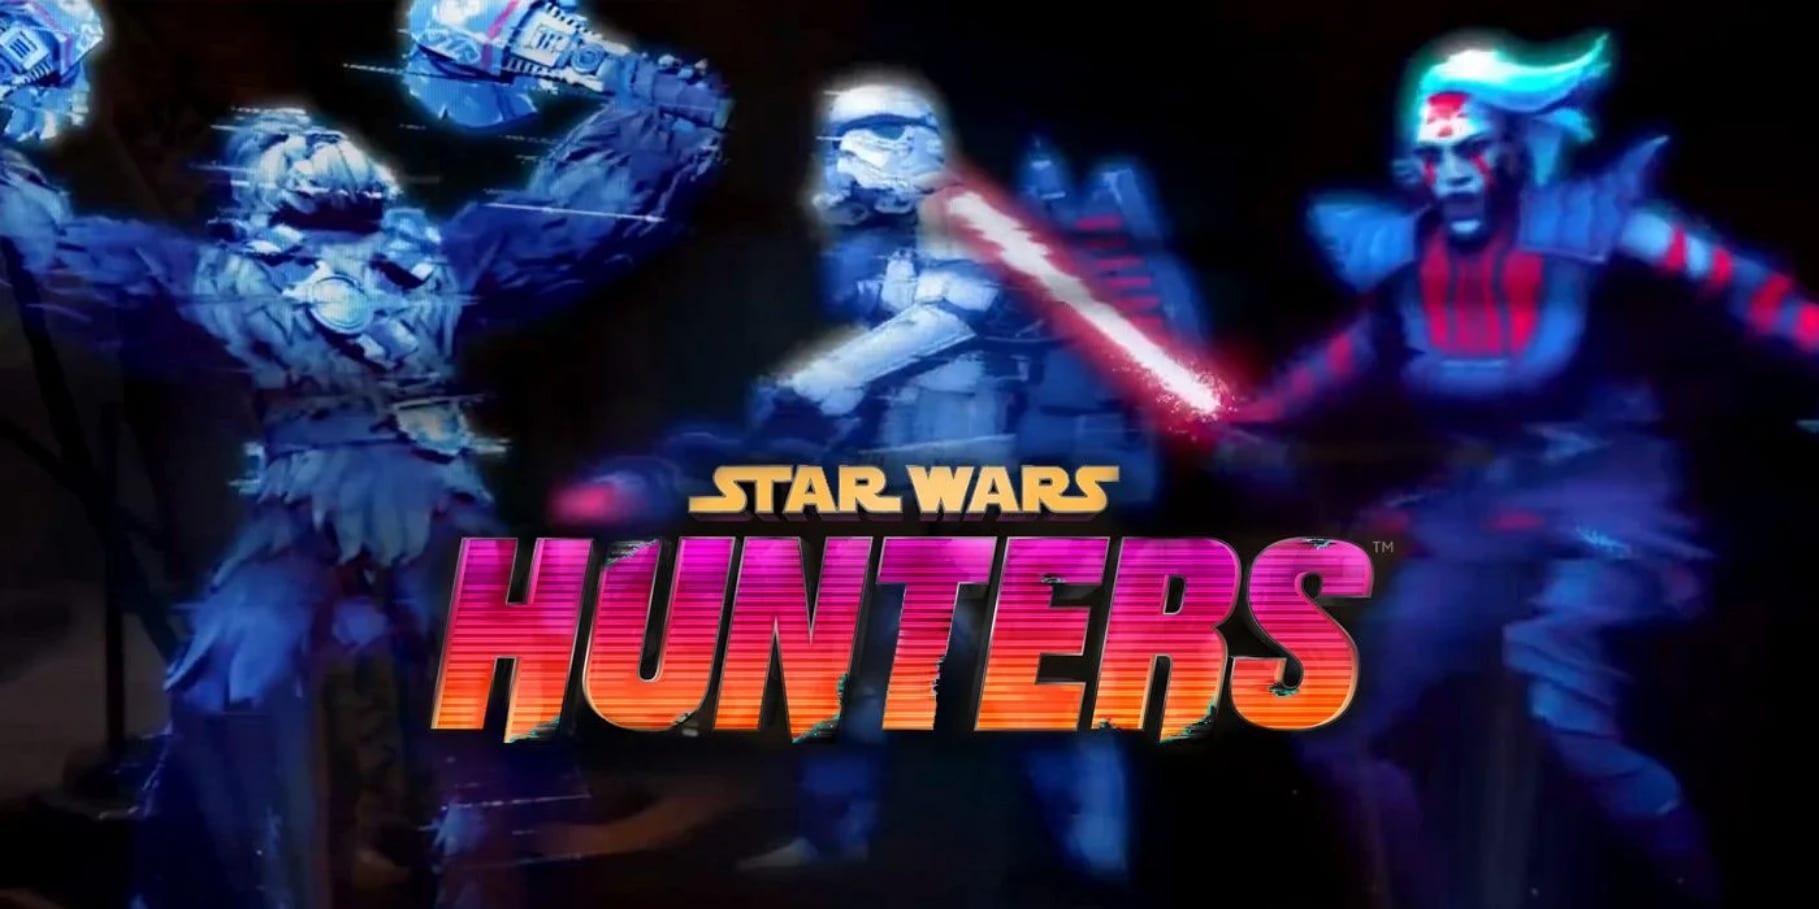 Star Wars: Hunters – Announcement Trailer